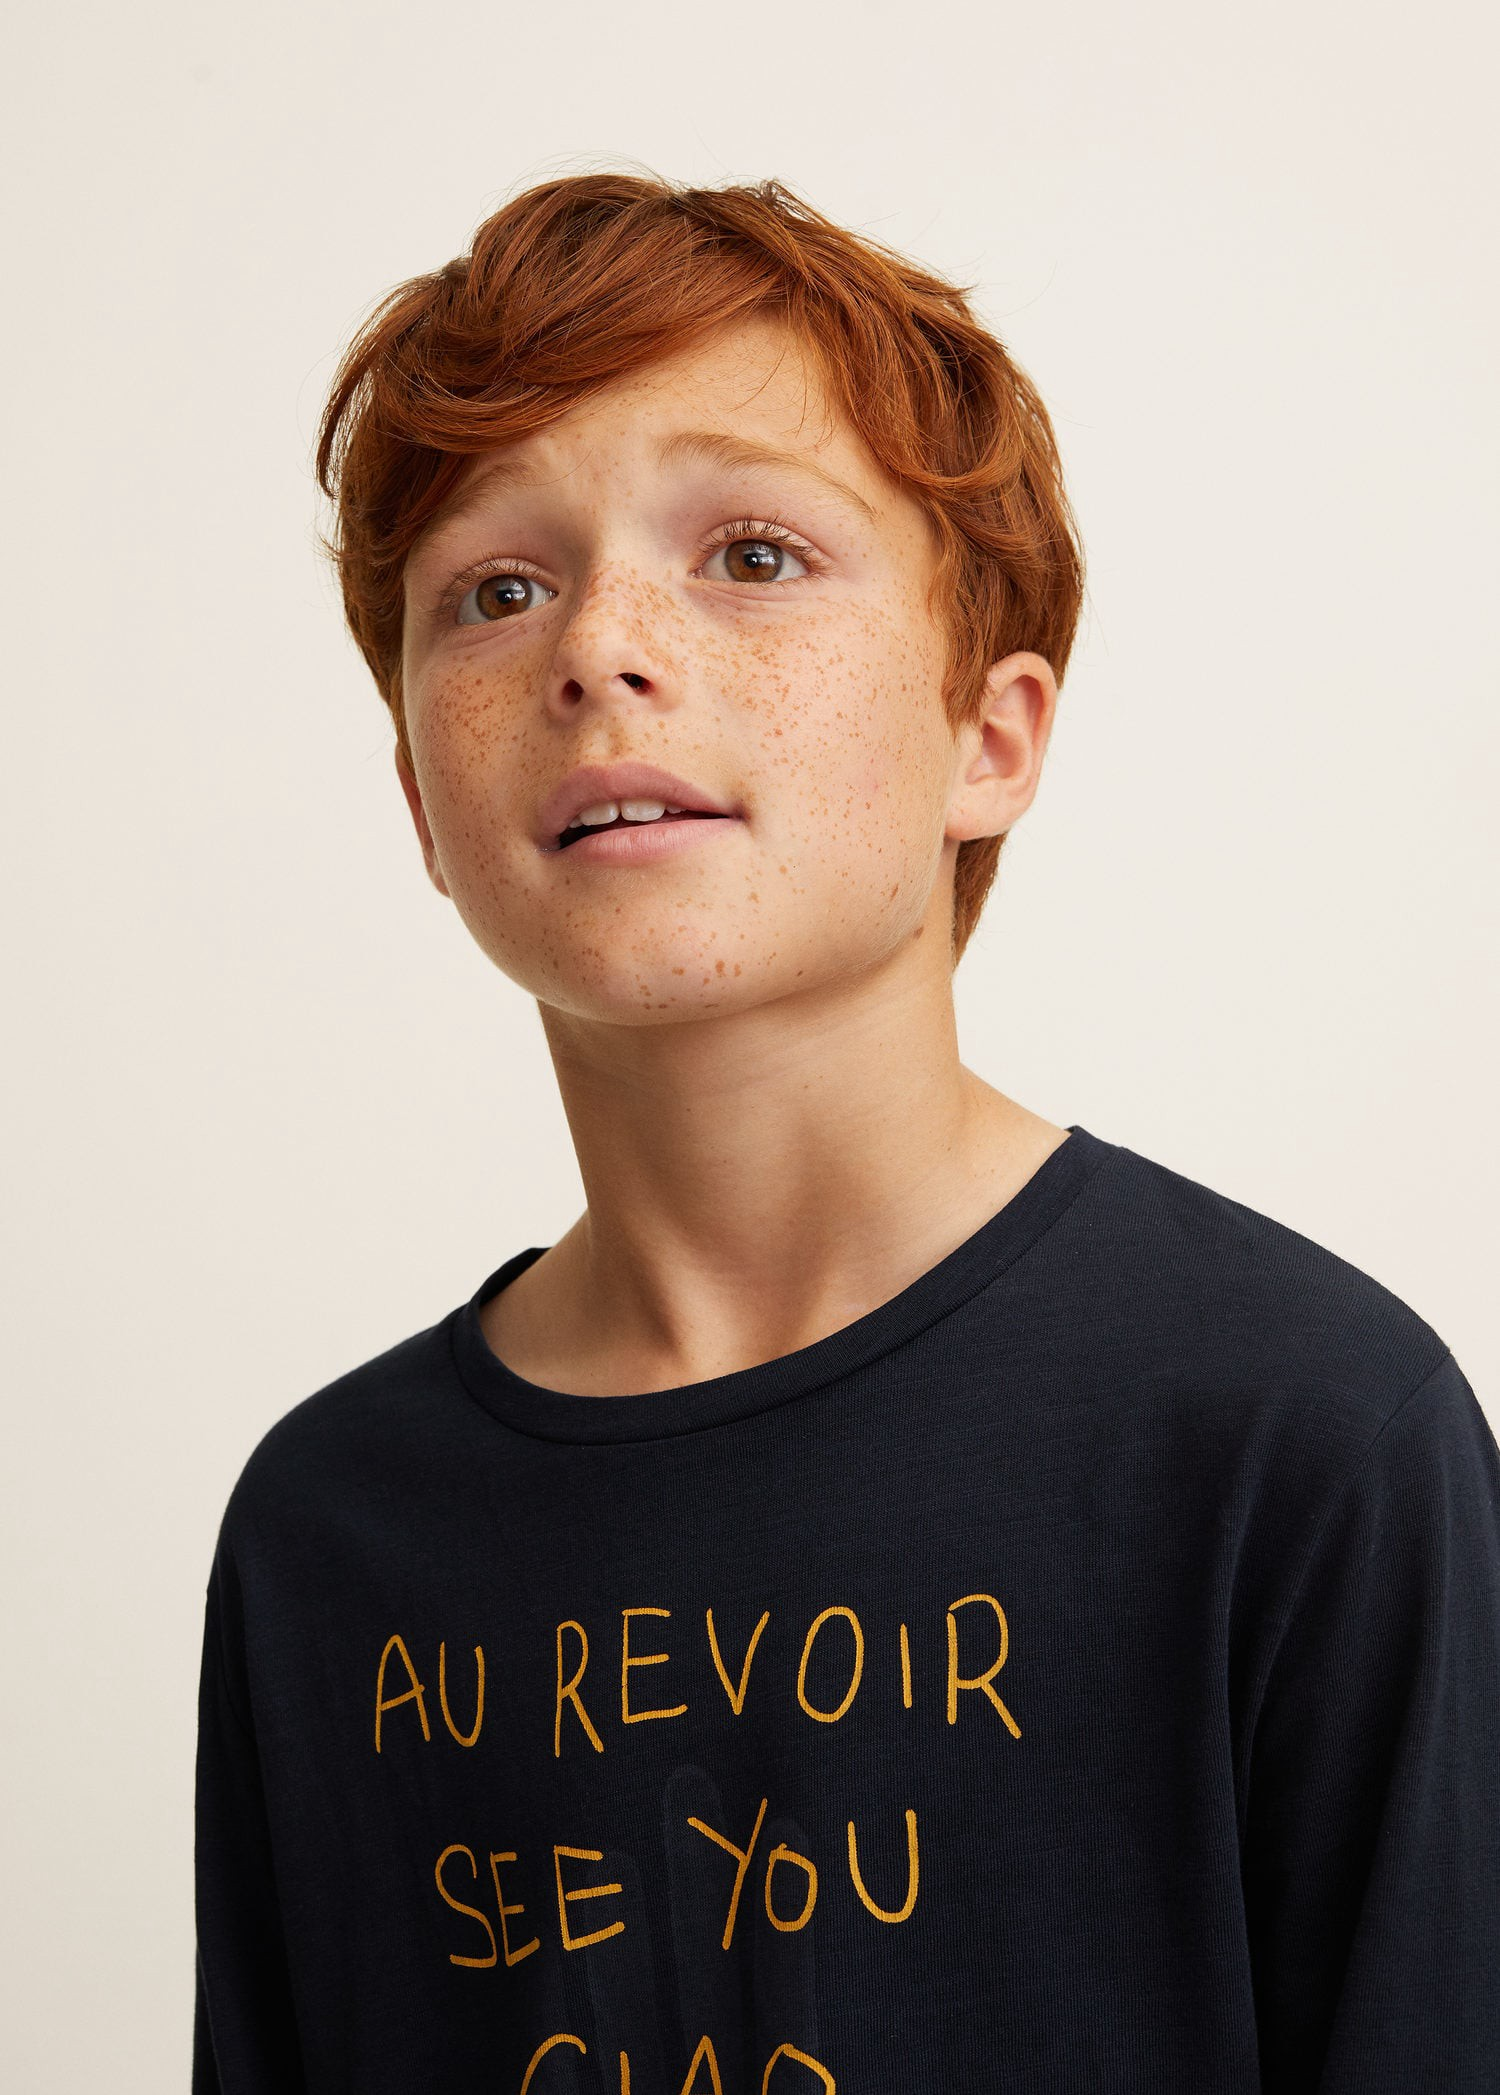 Mango Printed Cotton Blend T Shirt Off White 13 14 Years 164cm Boys Fashion Trends Little Boy Fashion Printed Cotton